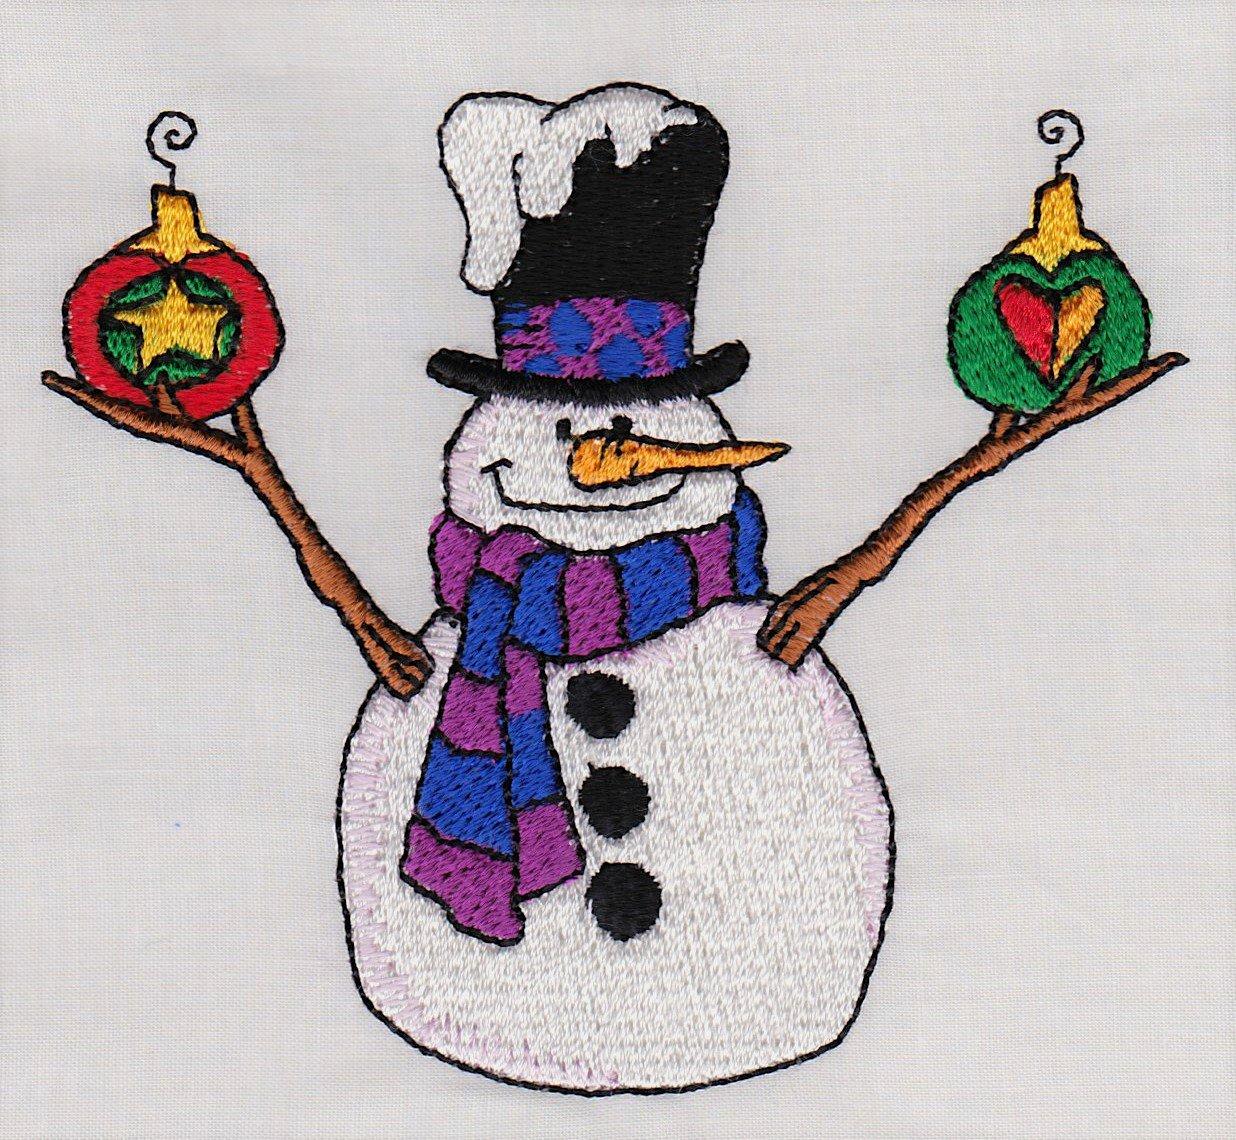 Snowman 1 4x4